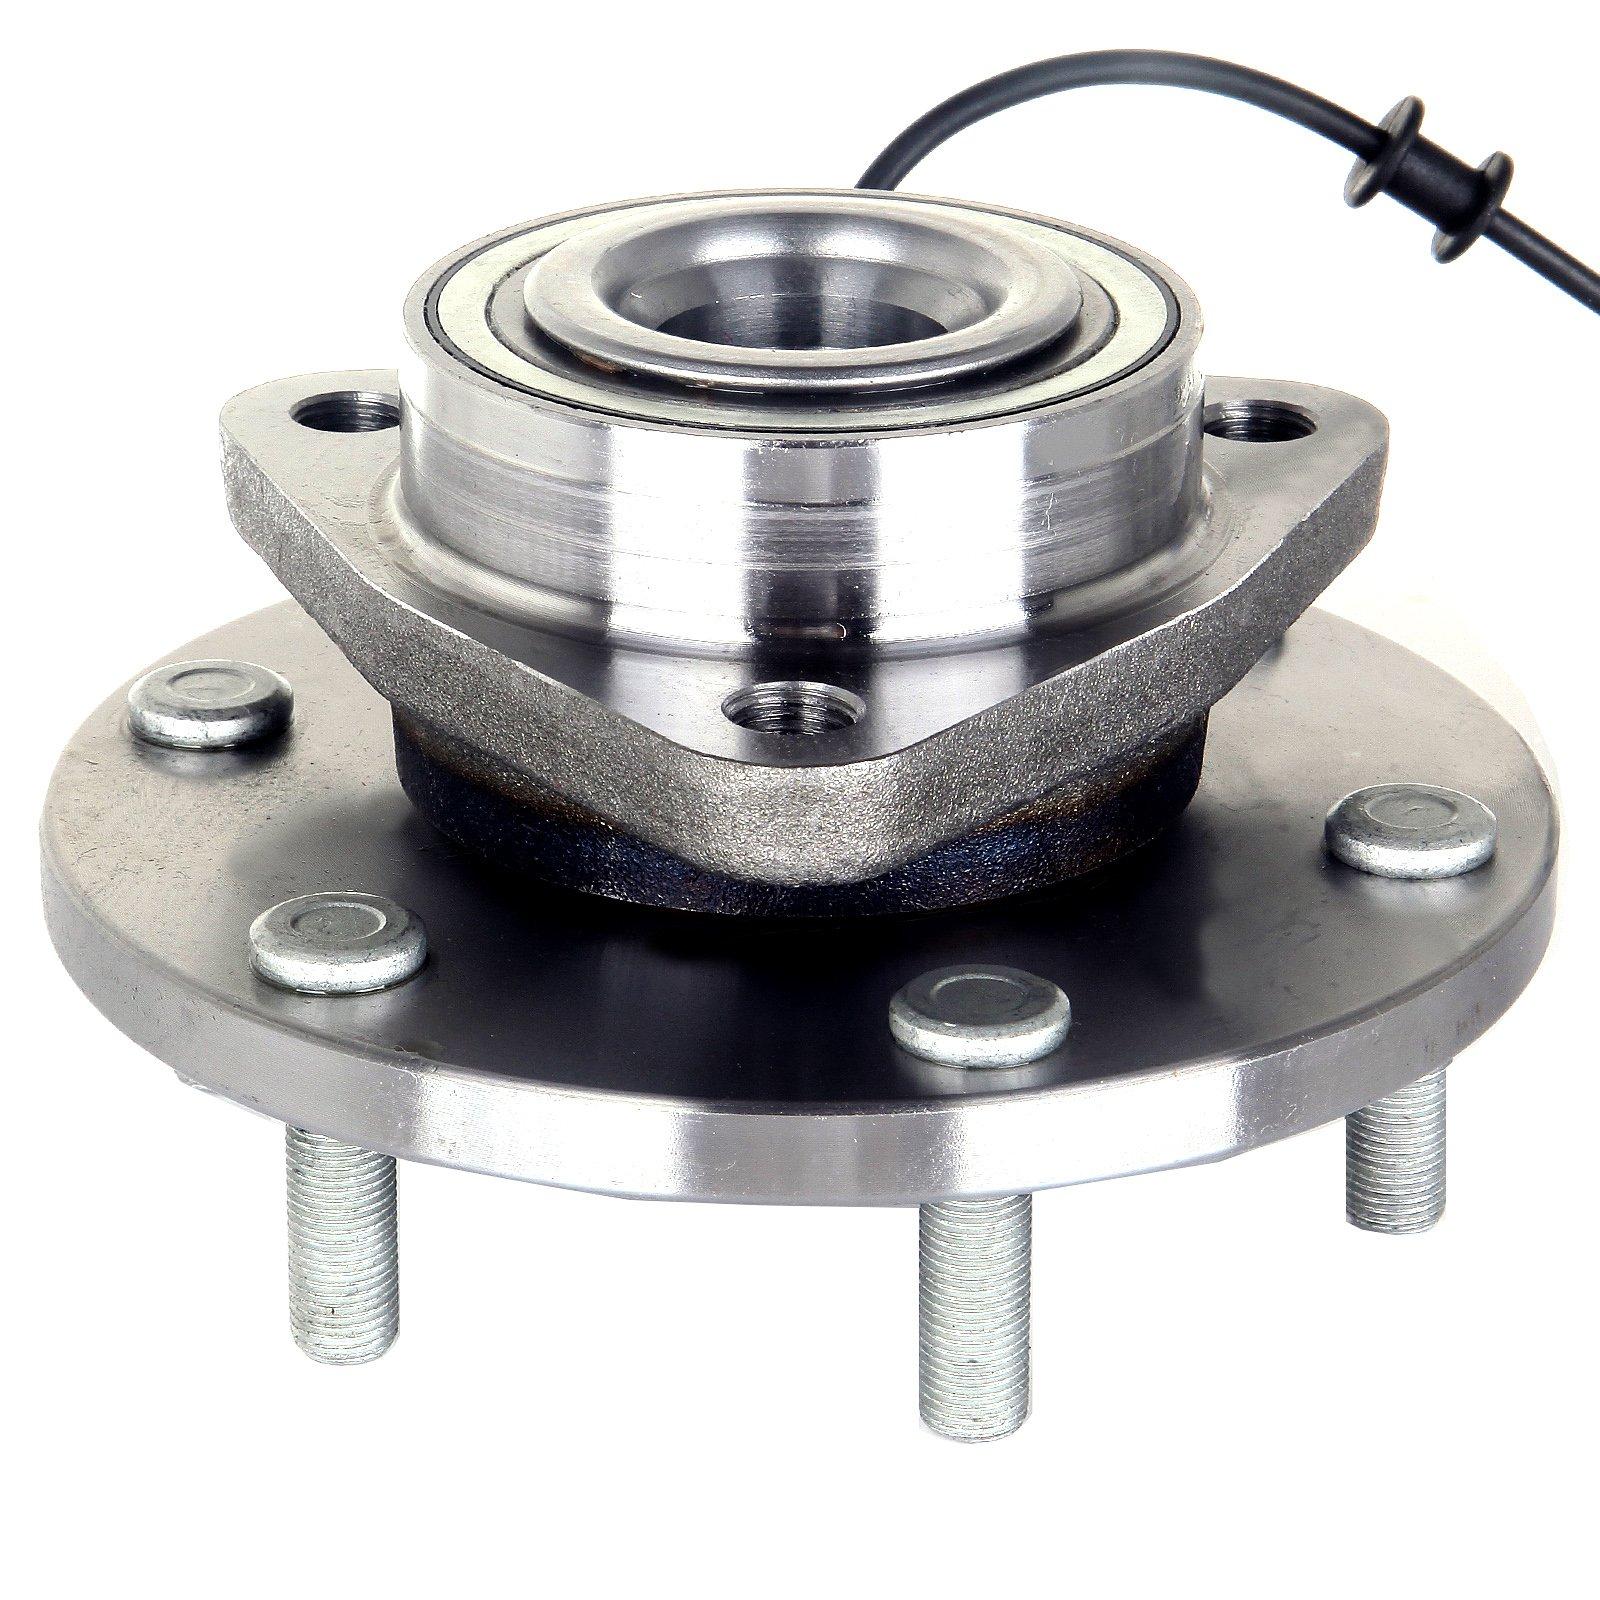 ECCPP New Front Wheel Hub Bearing Assembly 515066 for Nissan Armada Titan Pathfinder QX56 6 Lug W/ABS (515066 x1)